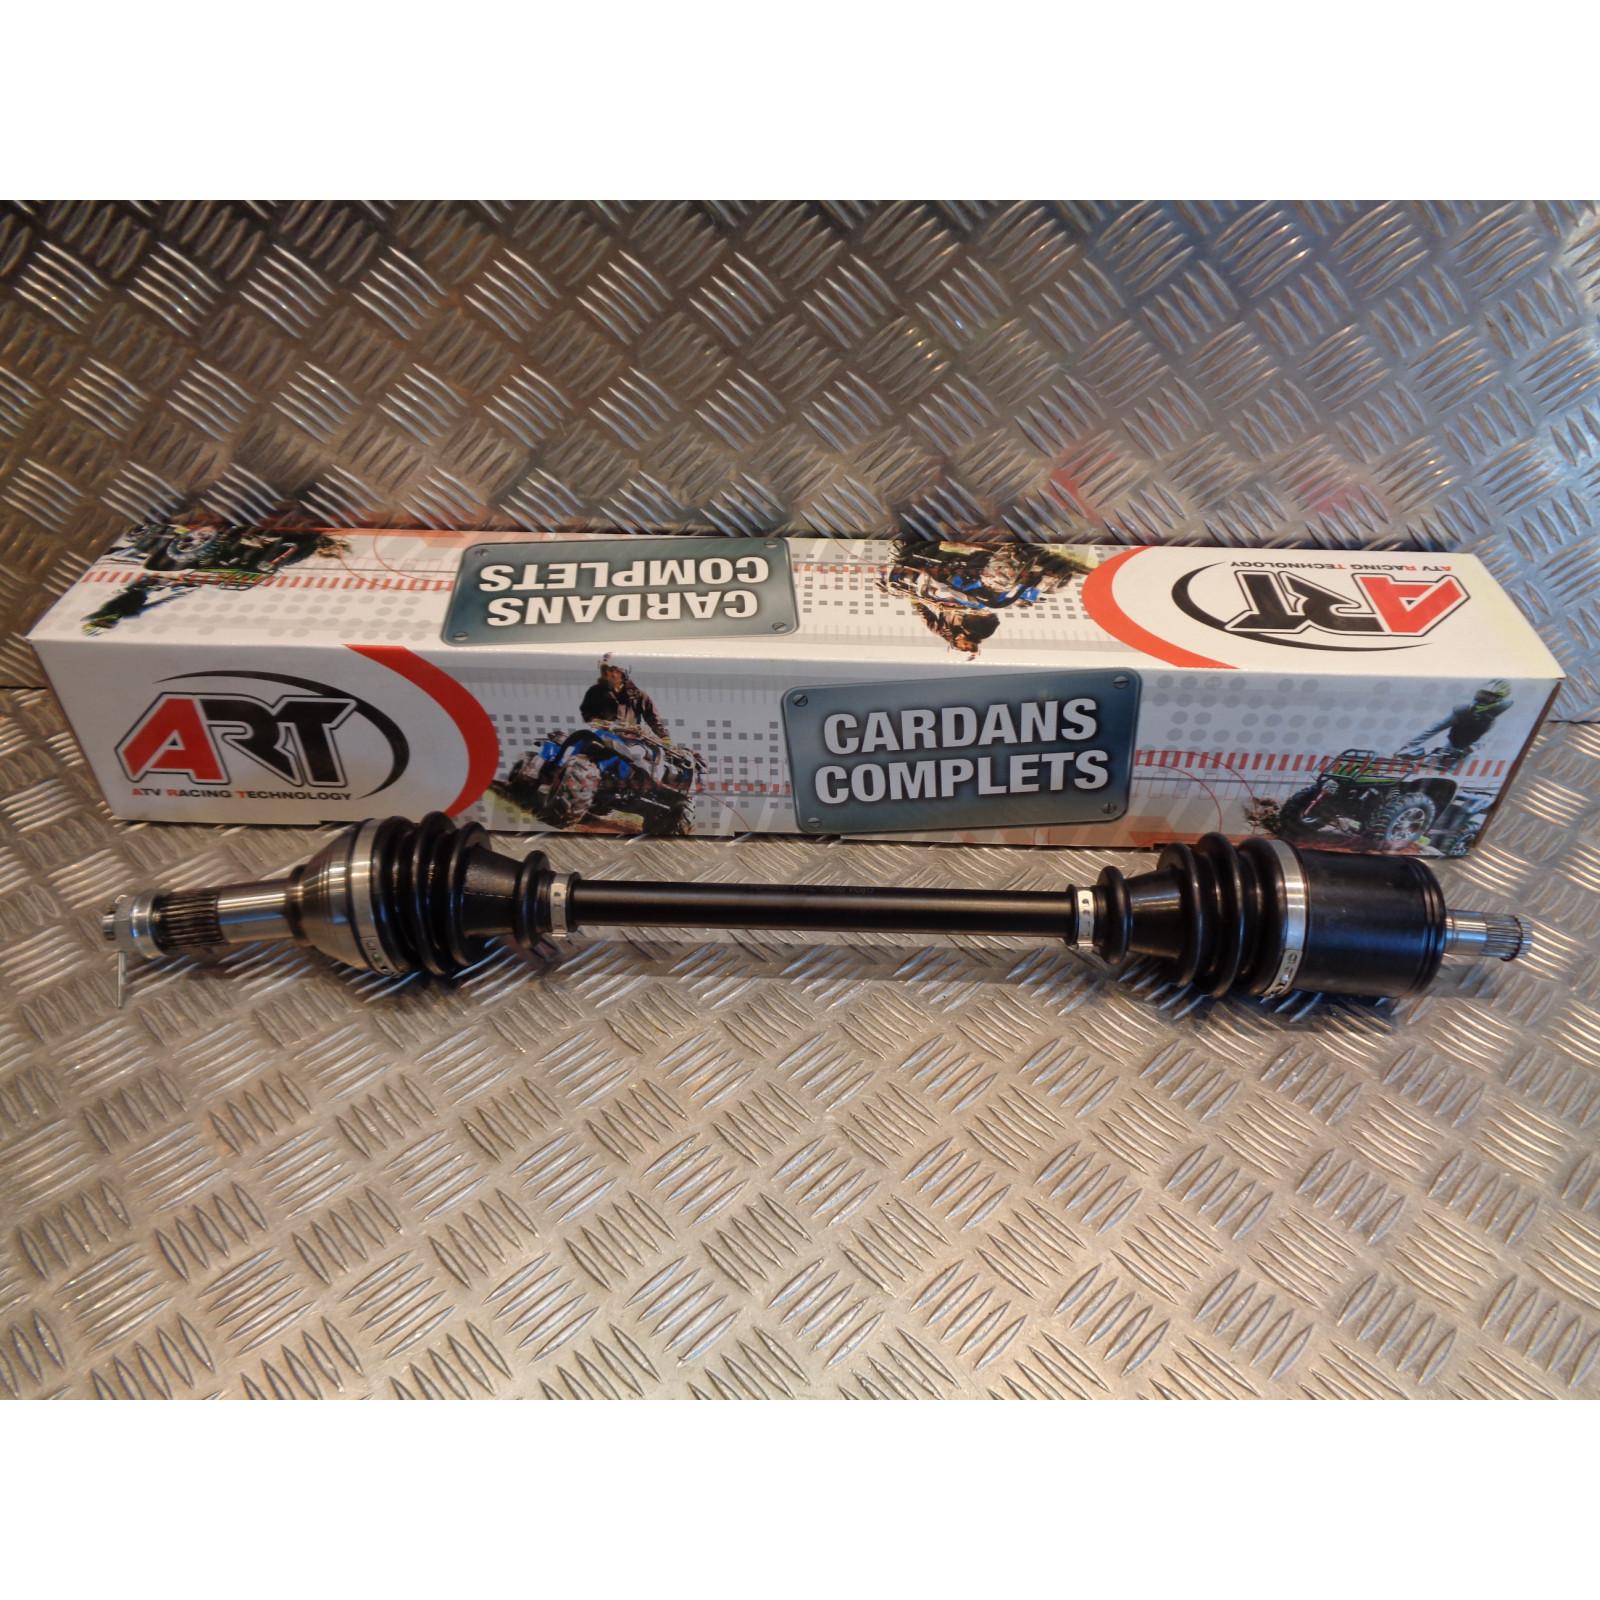 cardan complet avant droit quad buggy ssv can am 500 800 1000 defender traxter ART PD-PAXL-3030 bihr 43100021